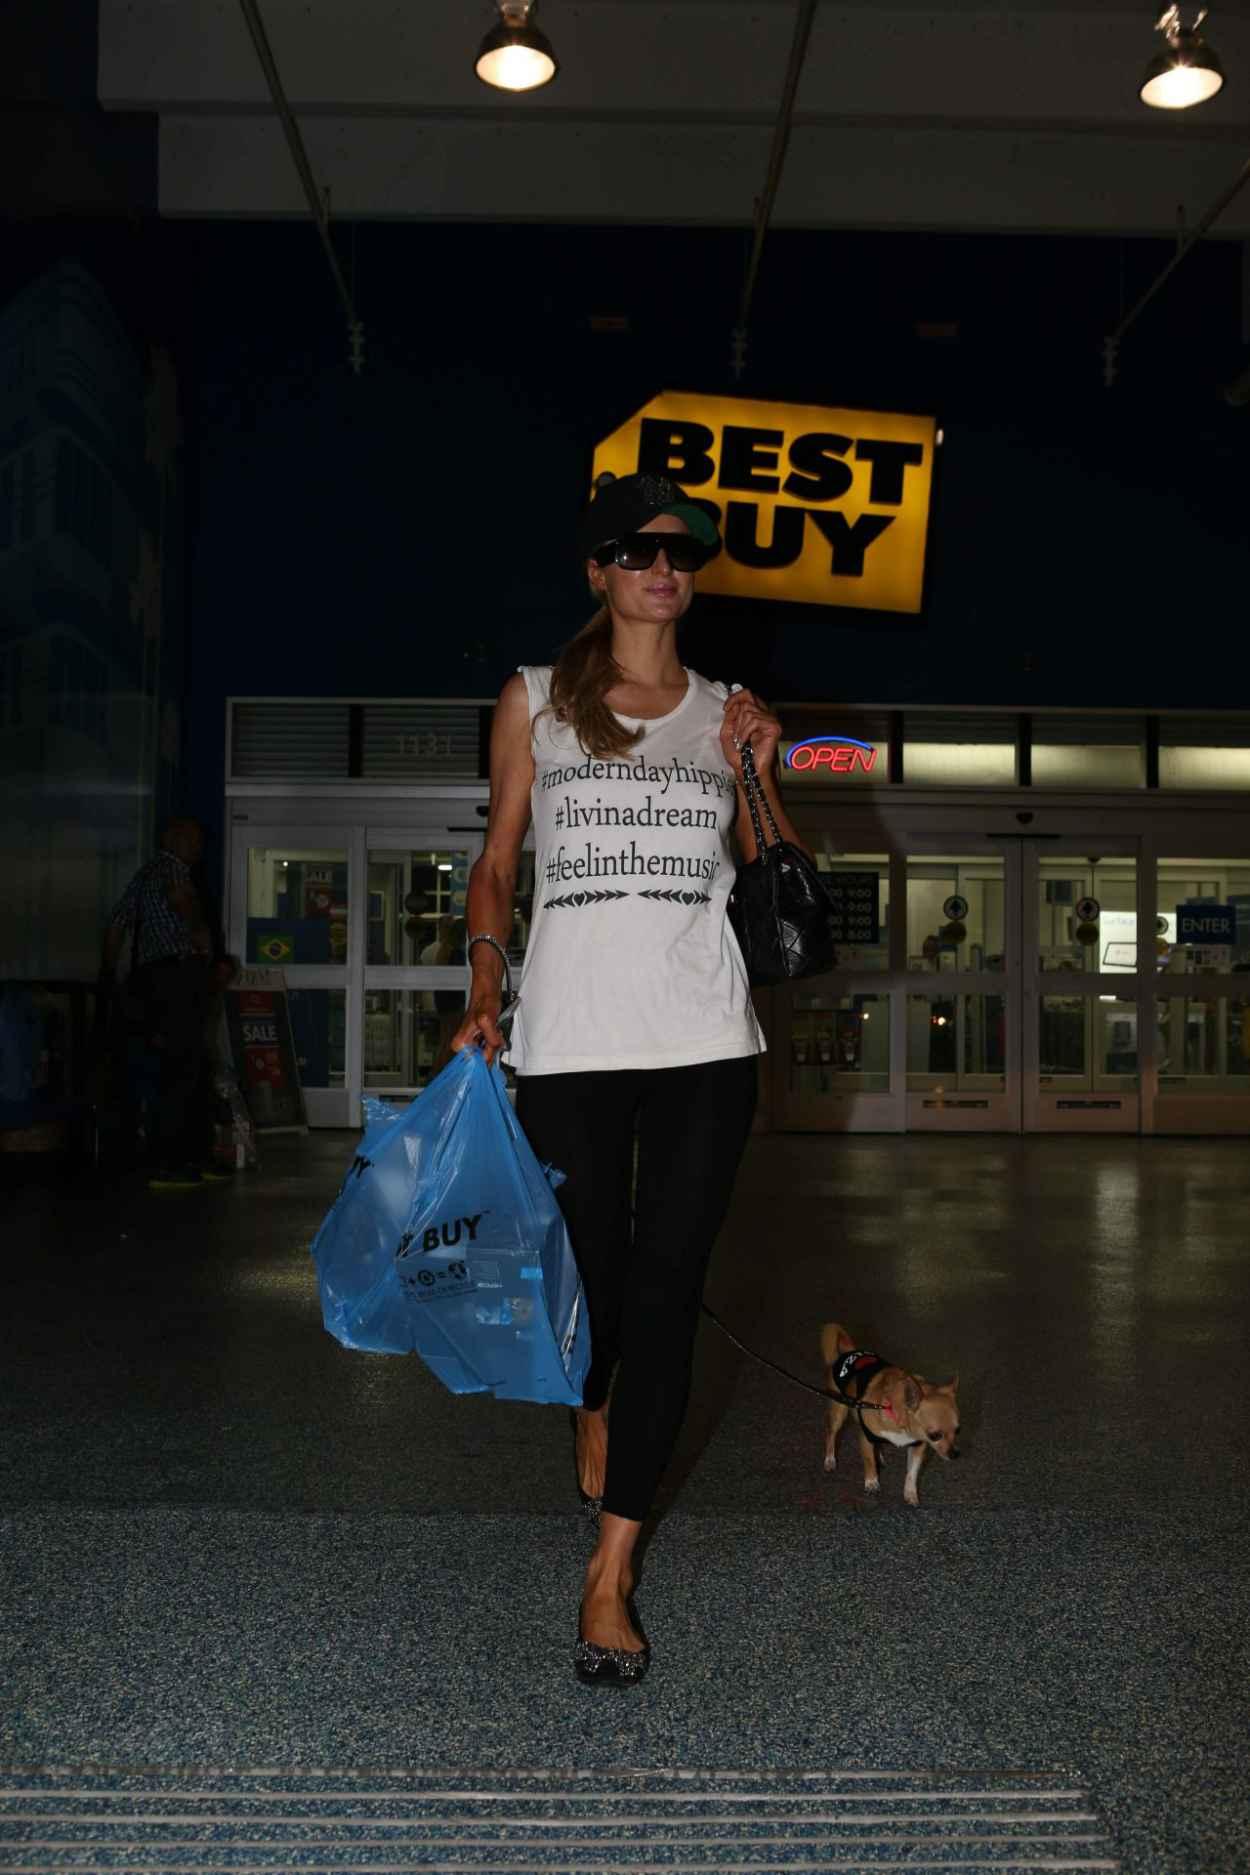 Paris Hilton Shopping at Best Buy - Miami Beach, February 2015-1